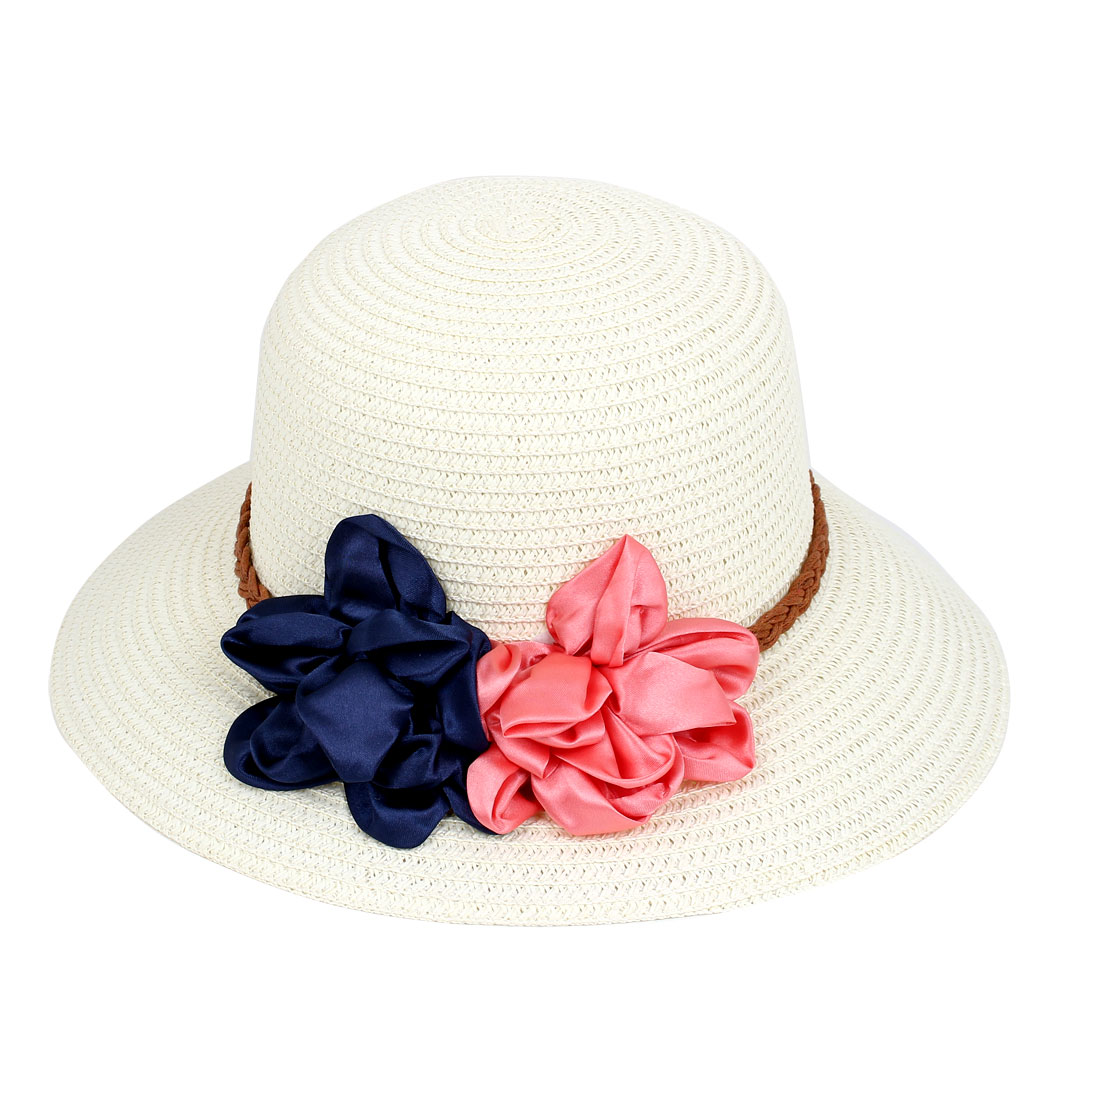 Lady Women Vacation Summer Beach Sun Floppy Wide Brim Floral Straw Hat Off  White d3d5fb64110d